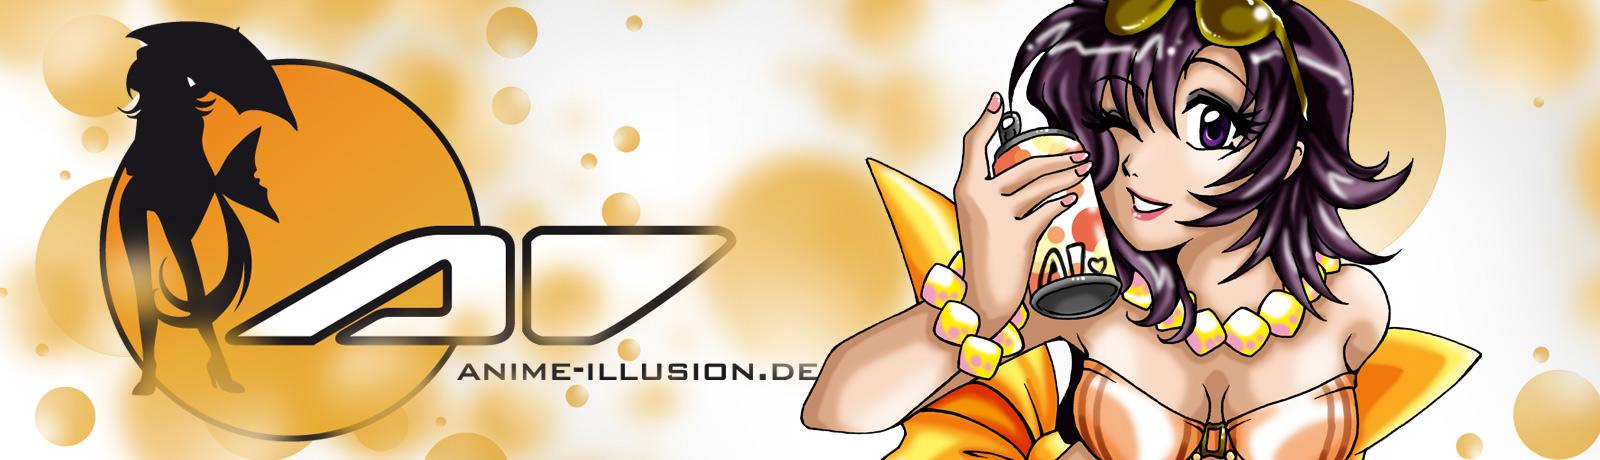 ::[ - Anime Illusion - ]::